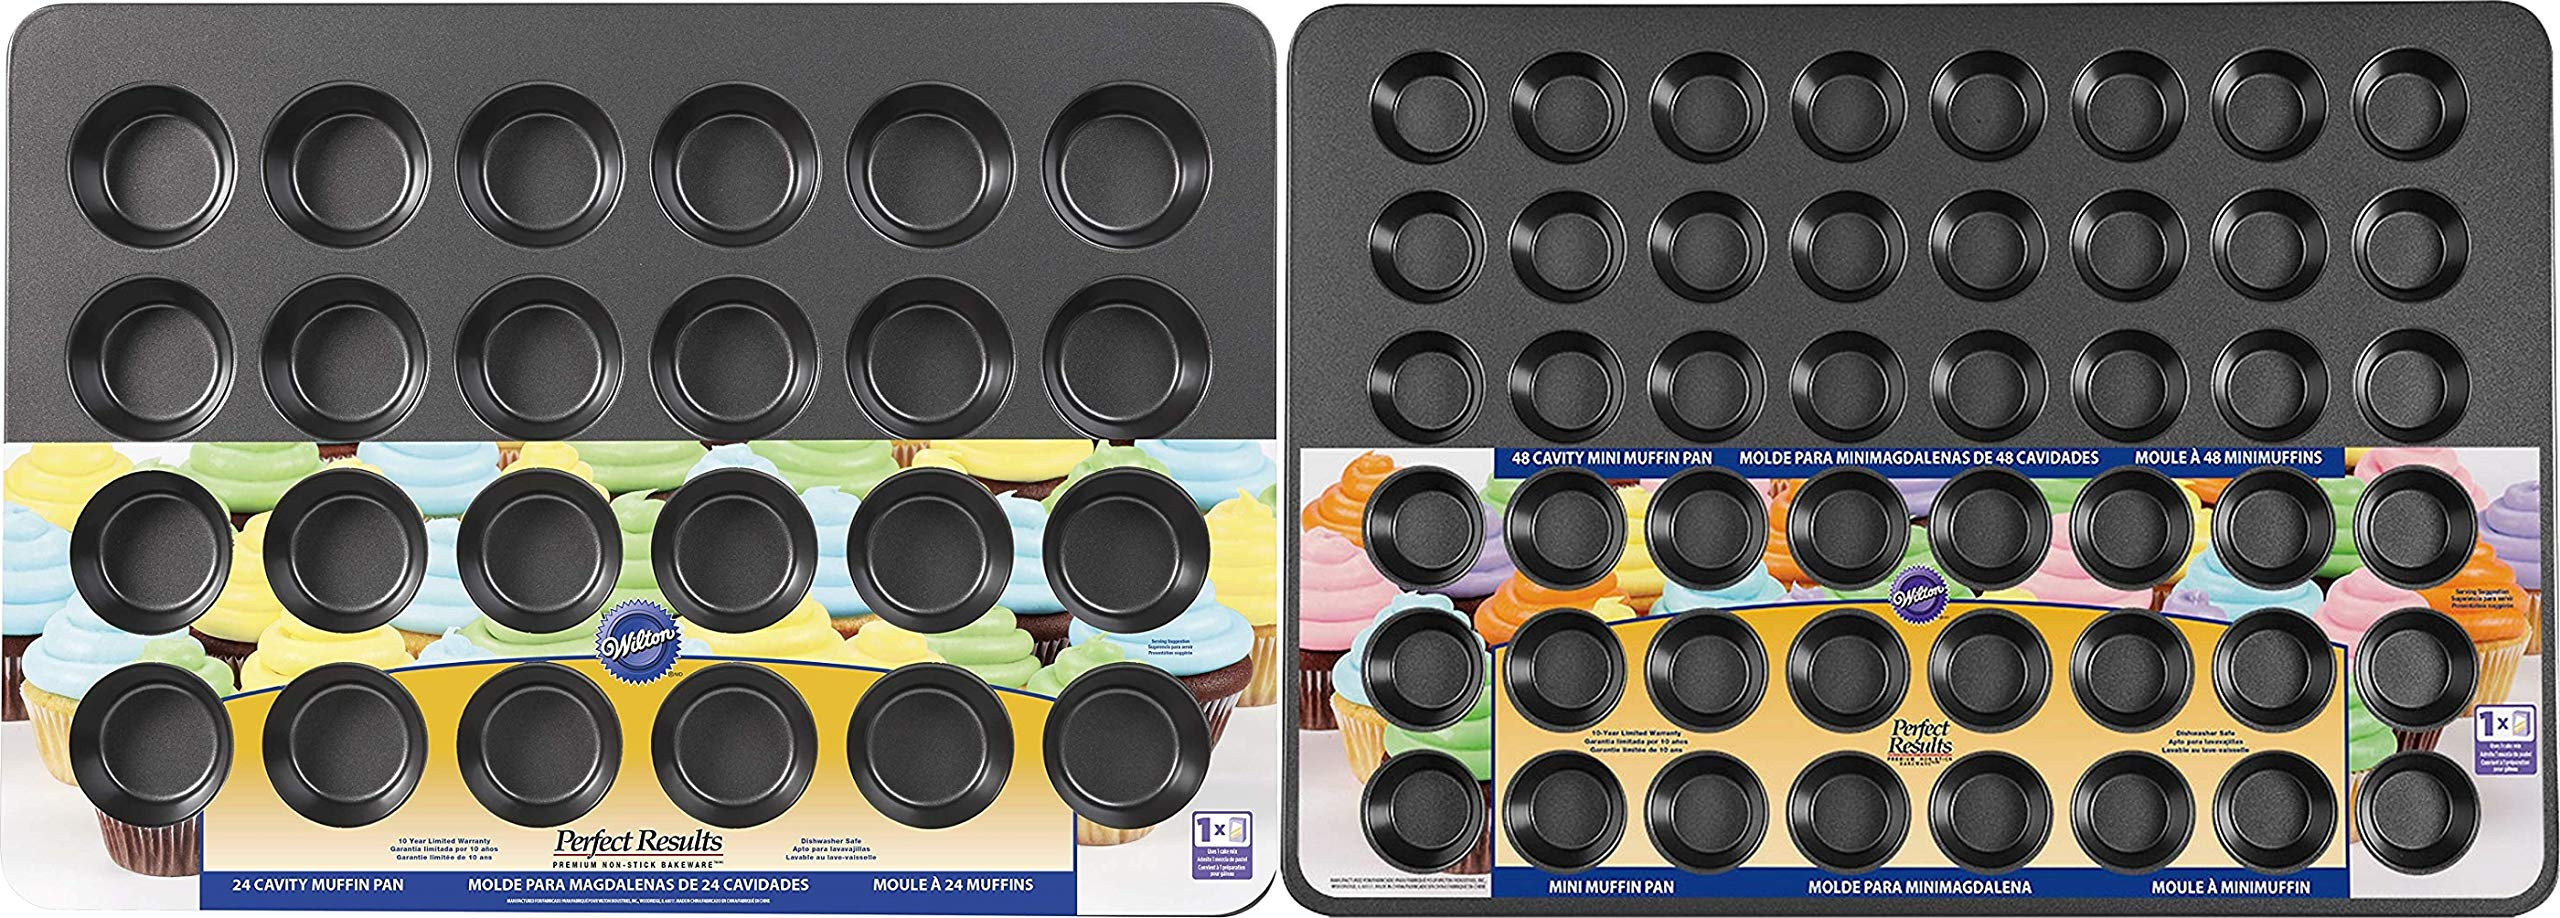 Wilton Non Stick Mega Muffin & Mini Muffin, Cupcake, Bakeware Set (24 Cup & 48 Cup) by Wilton